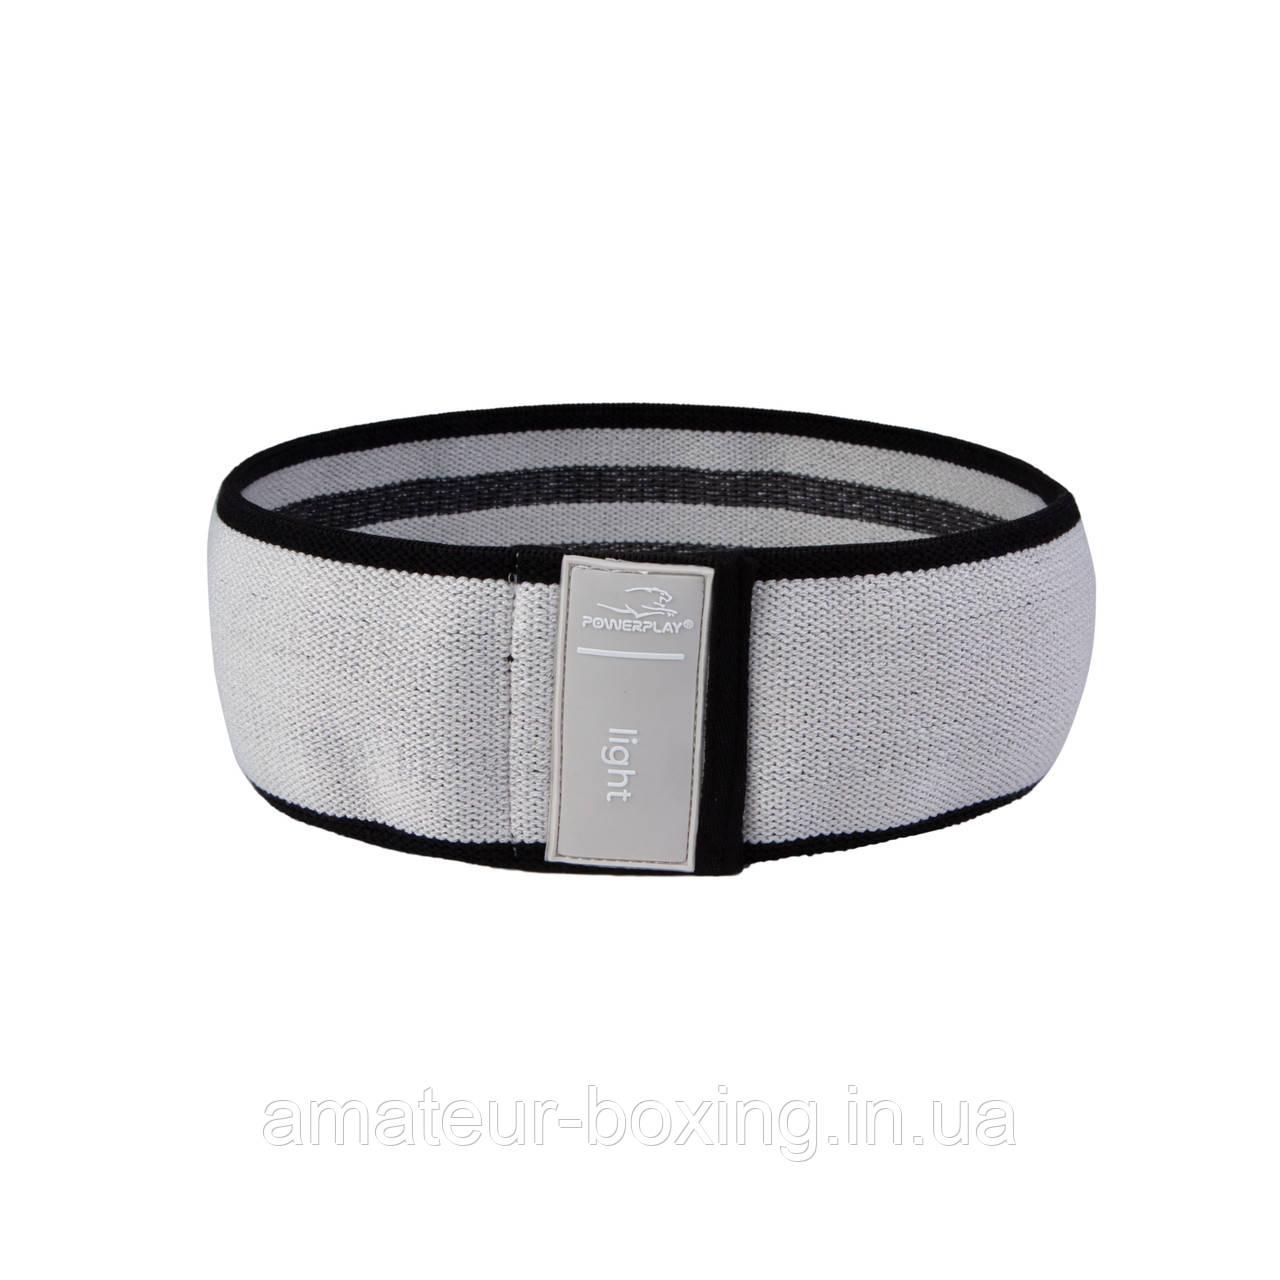 Гумка для фітнеса тканева PowerPlay 4111 S Сірий (d_64cm)